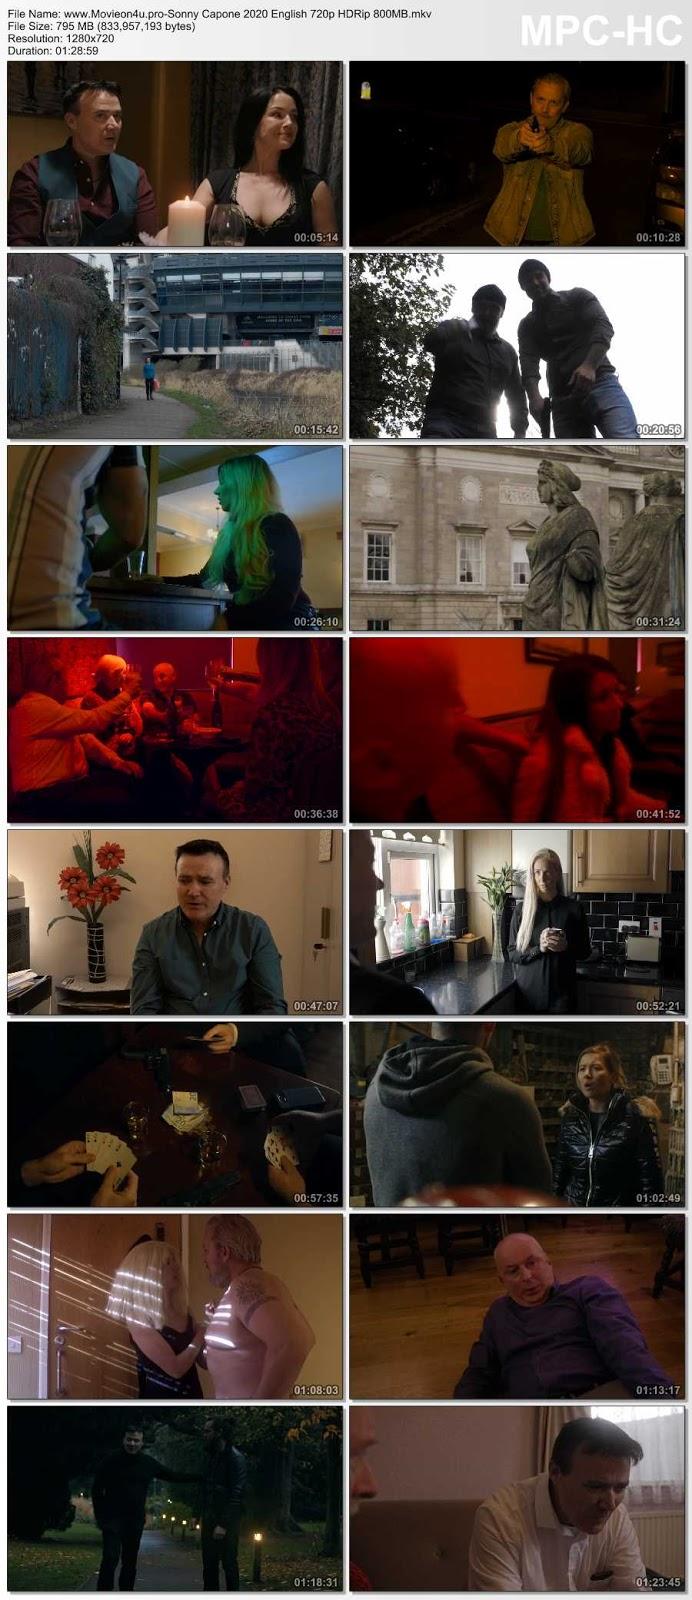 Tenet 2020 English Full Movie Download